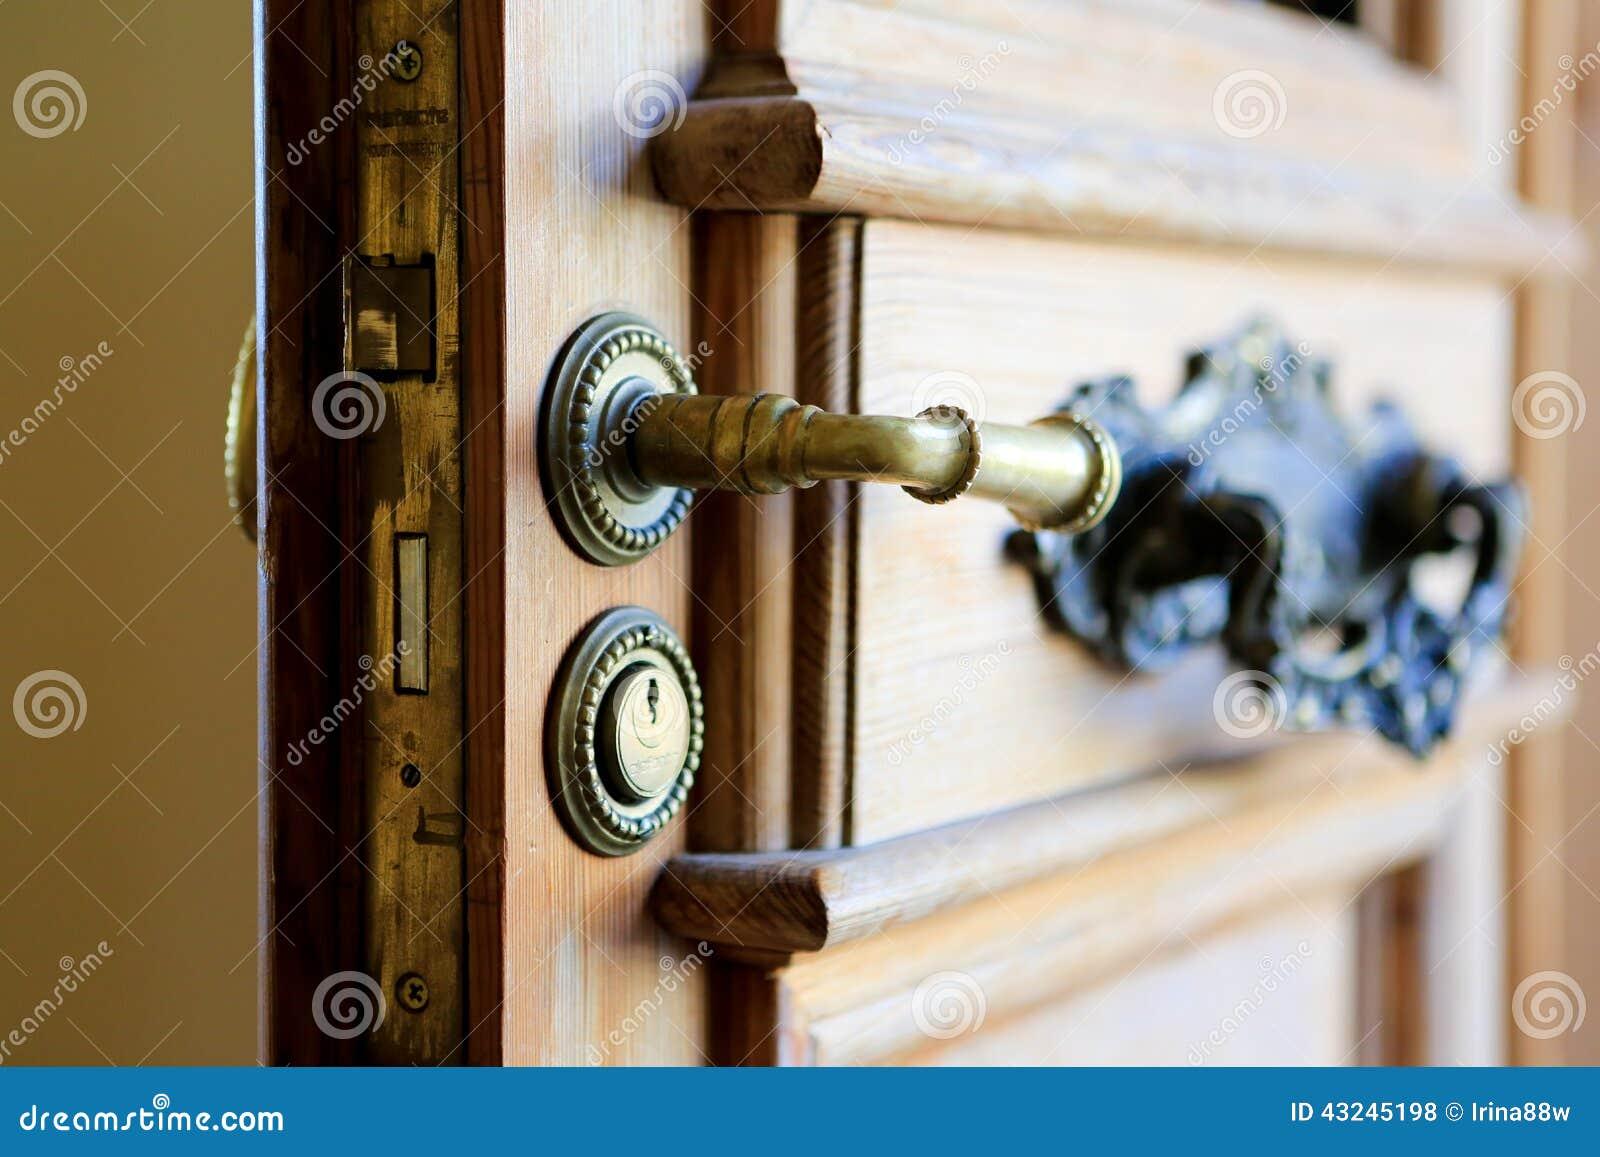 Poign e de porte d 39 entr e avec le trou de la serrure - Poignee de porte avec serrure integree ...